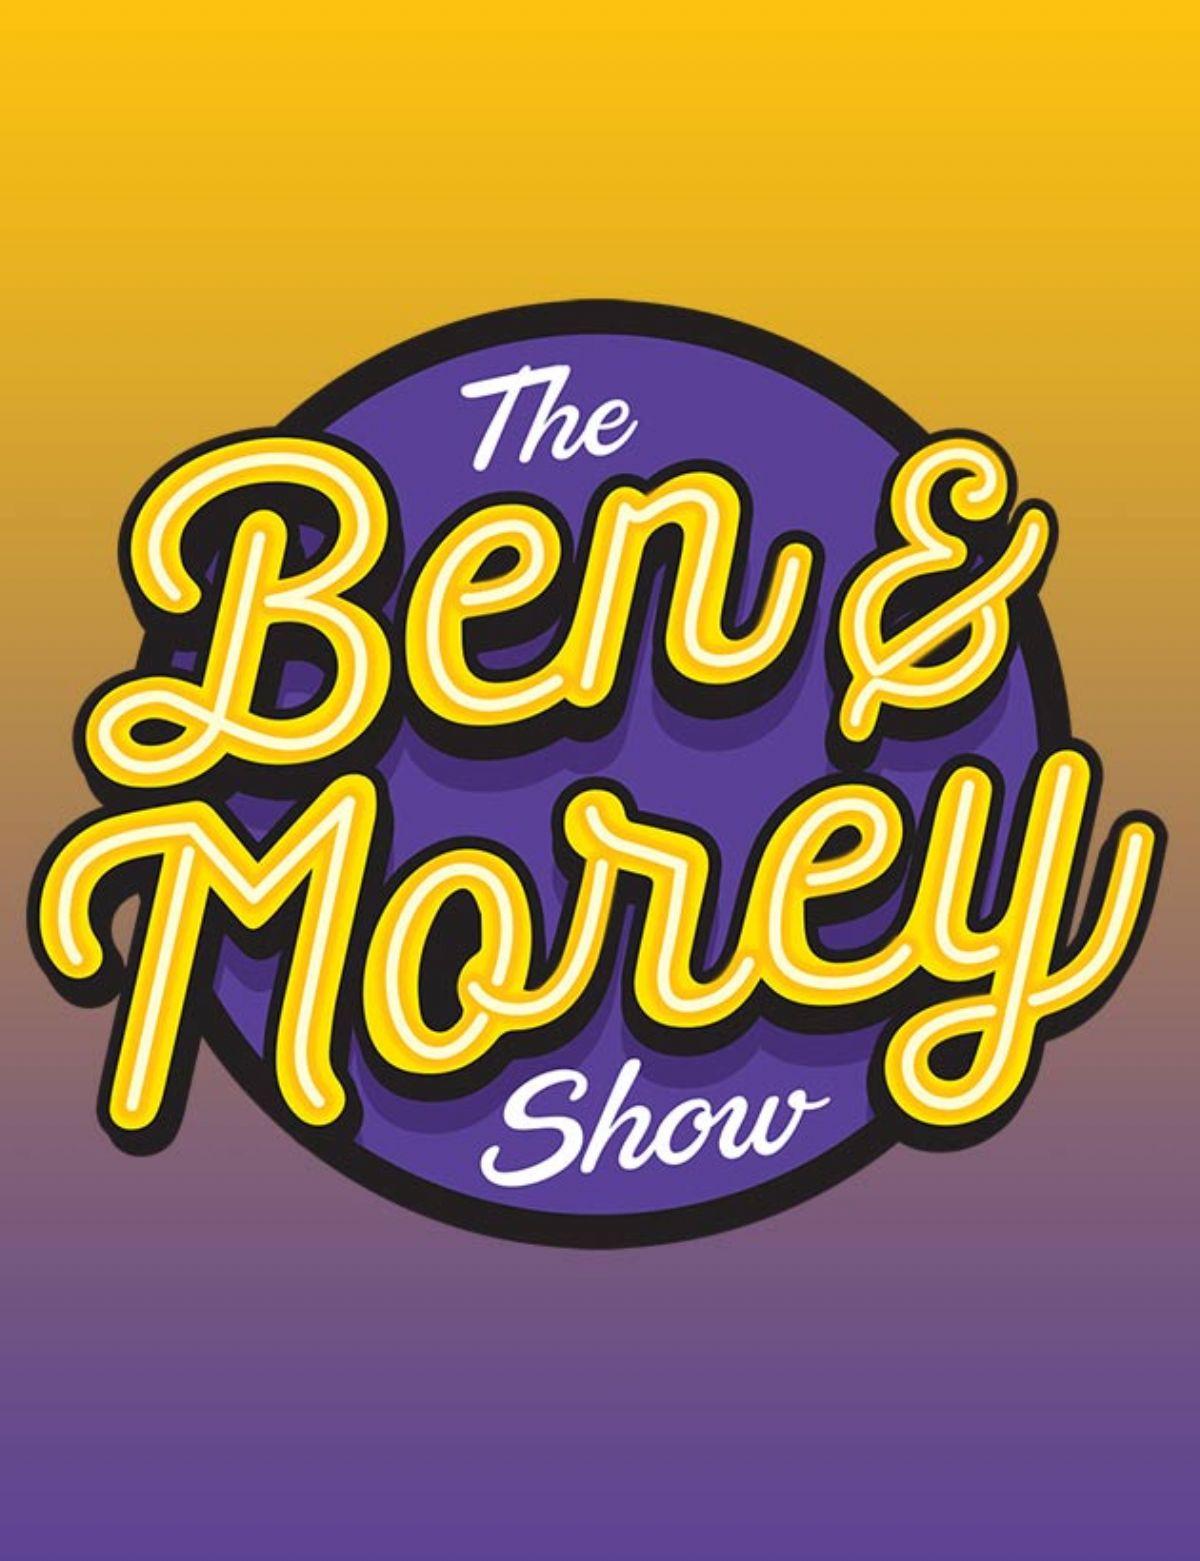 The Ben & Morey Show: A Benefit for Third Coast